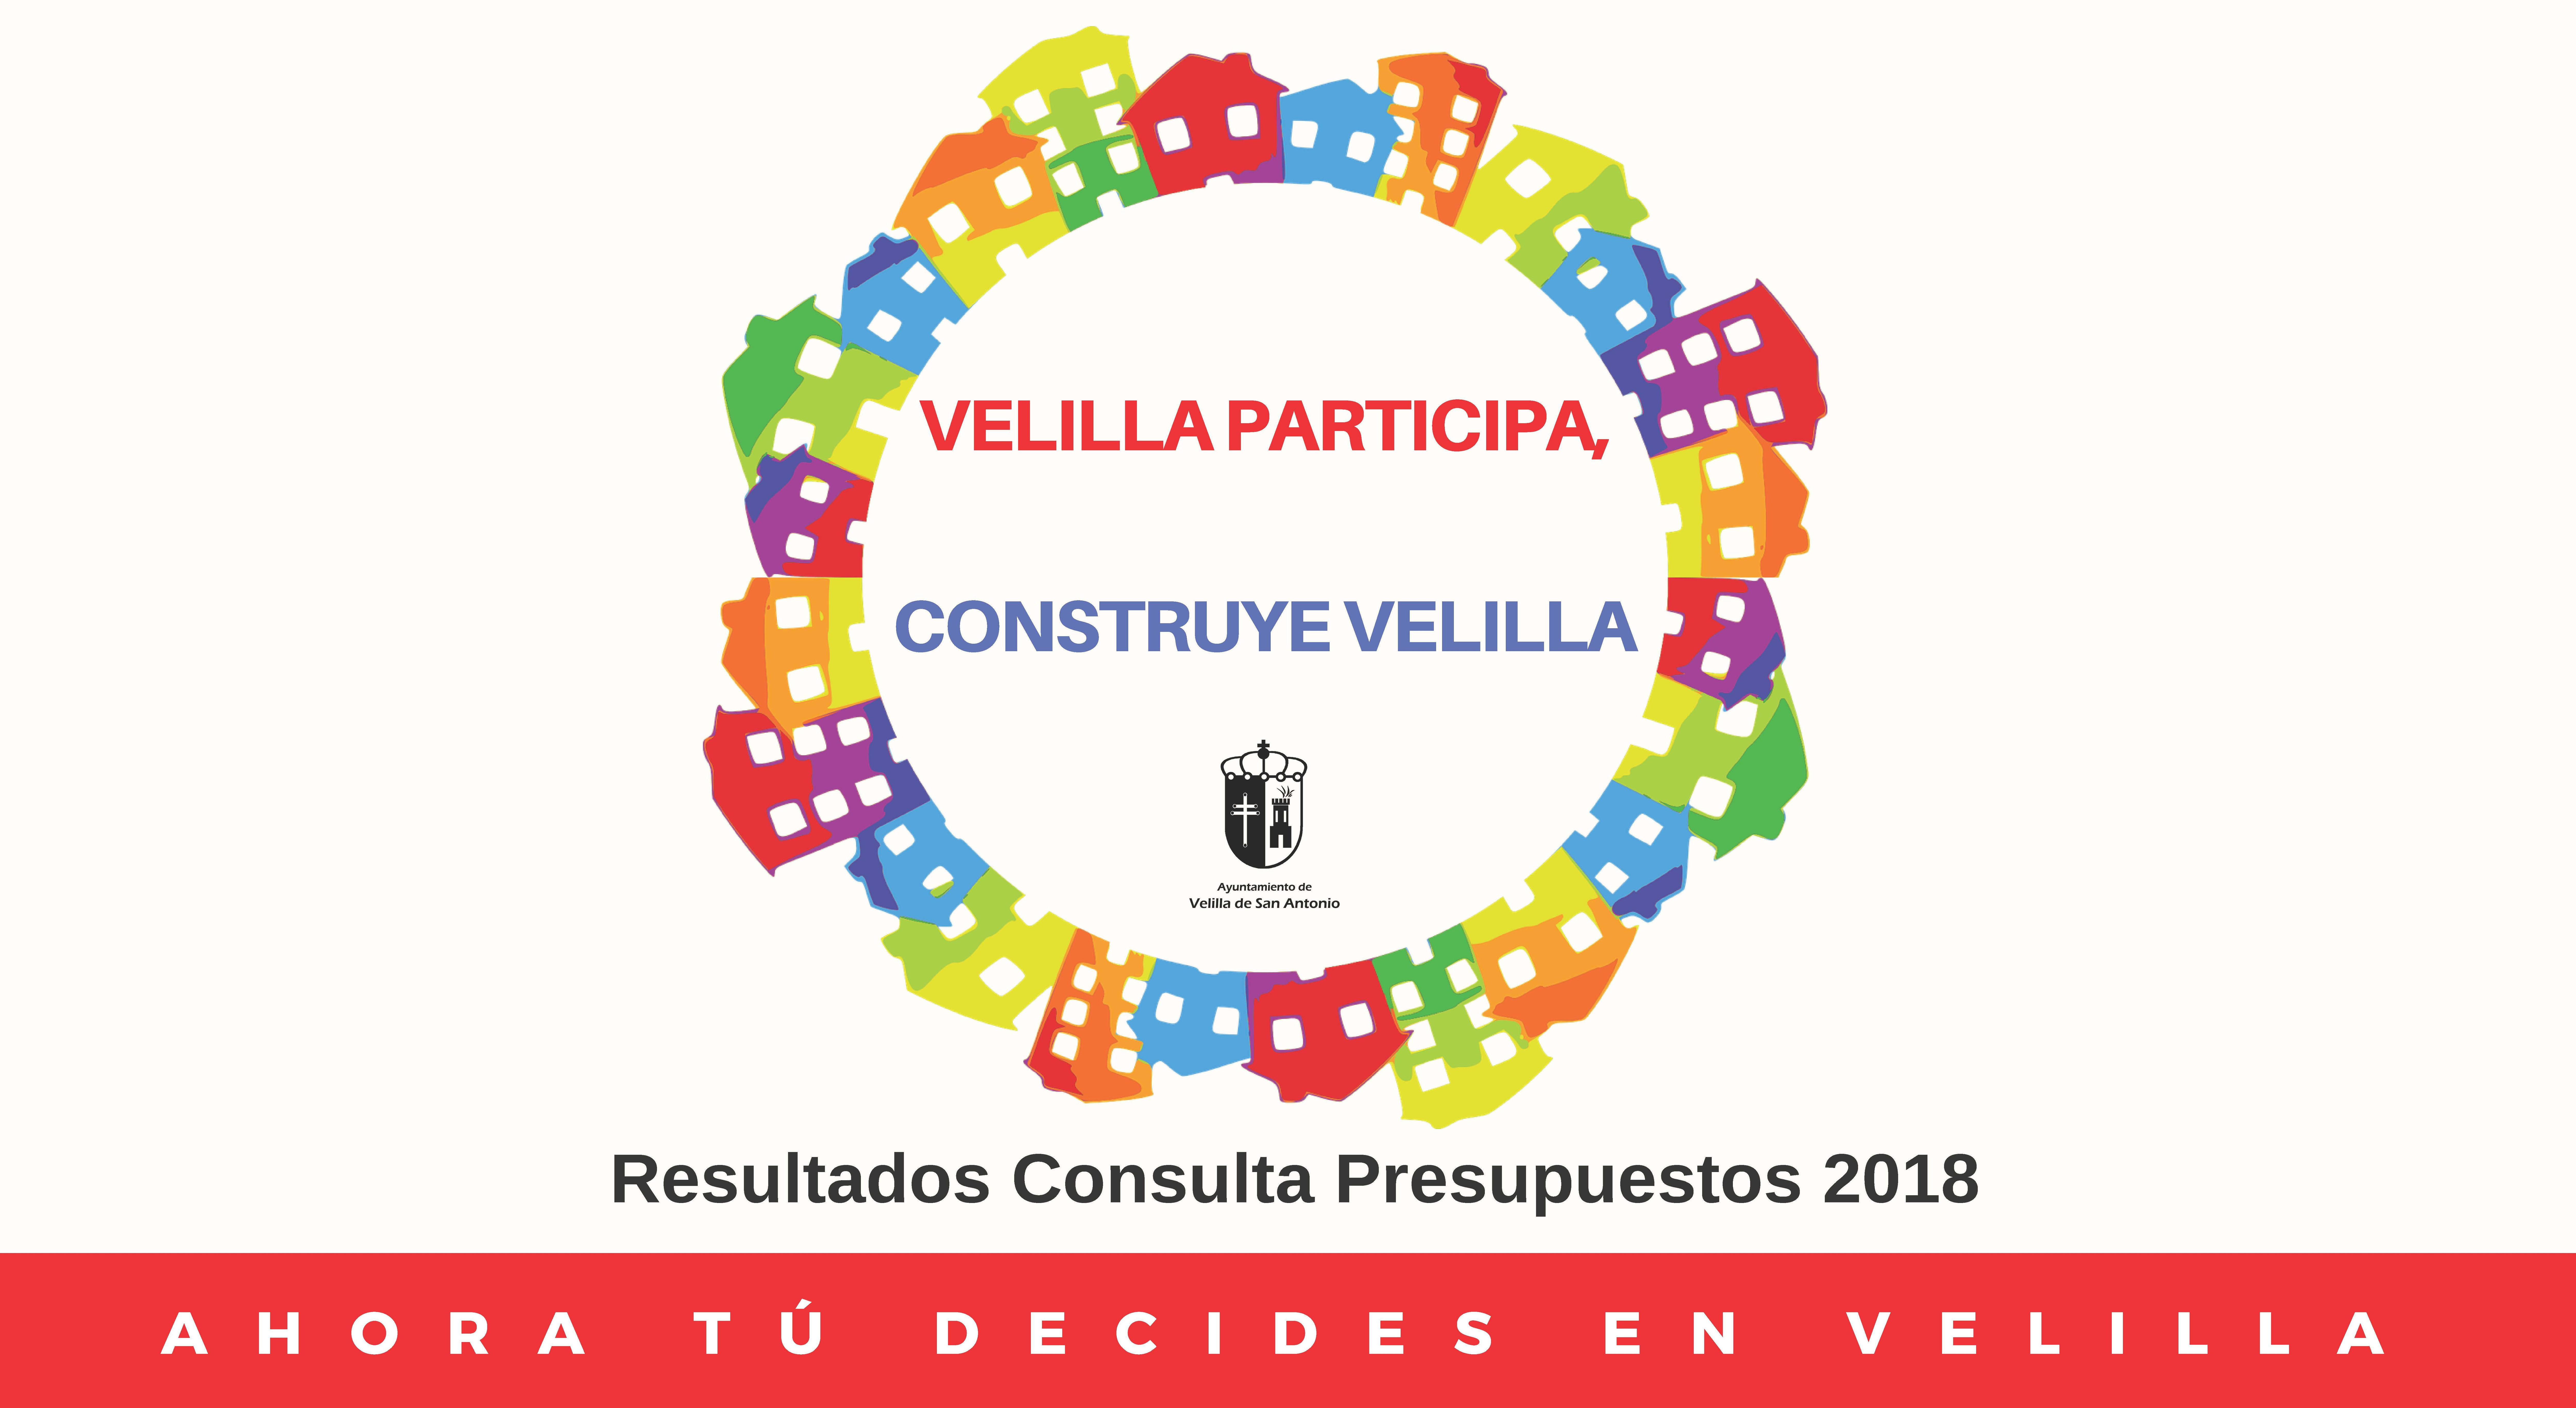 Resultados 2ª consulta Velilla Participa, Construye Velilla